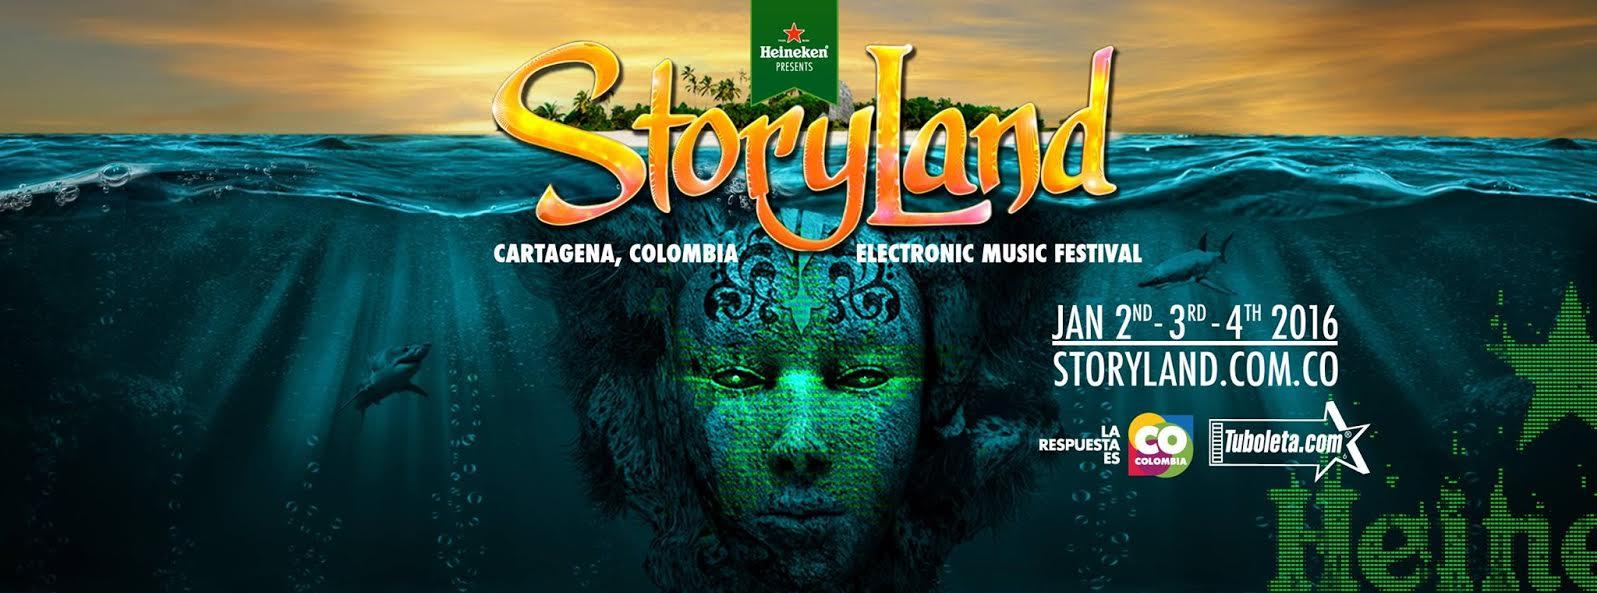 Storyland 2016